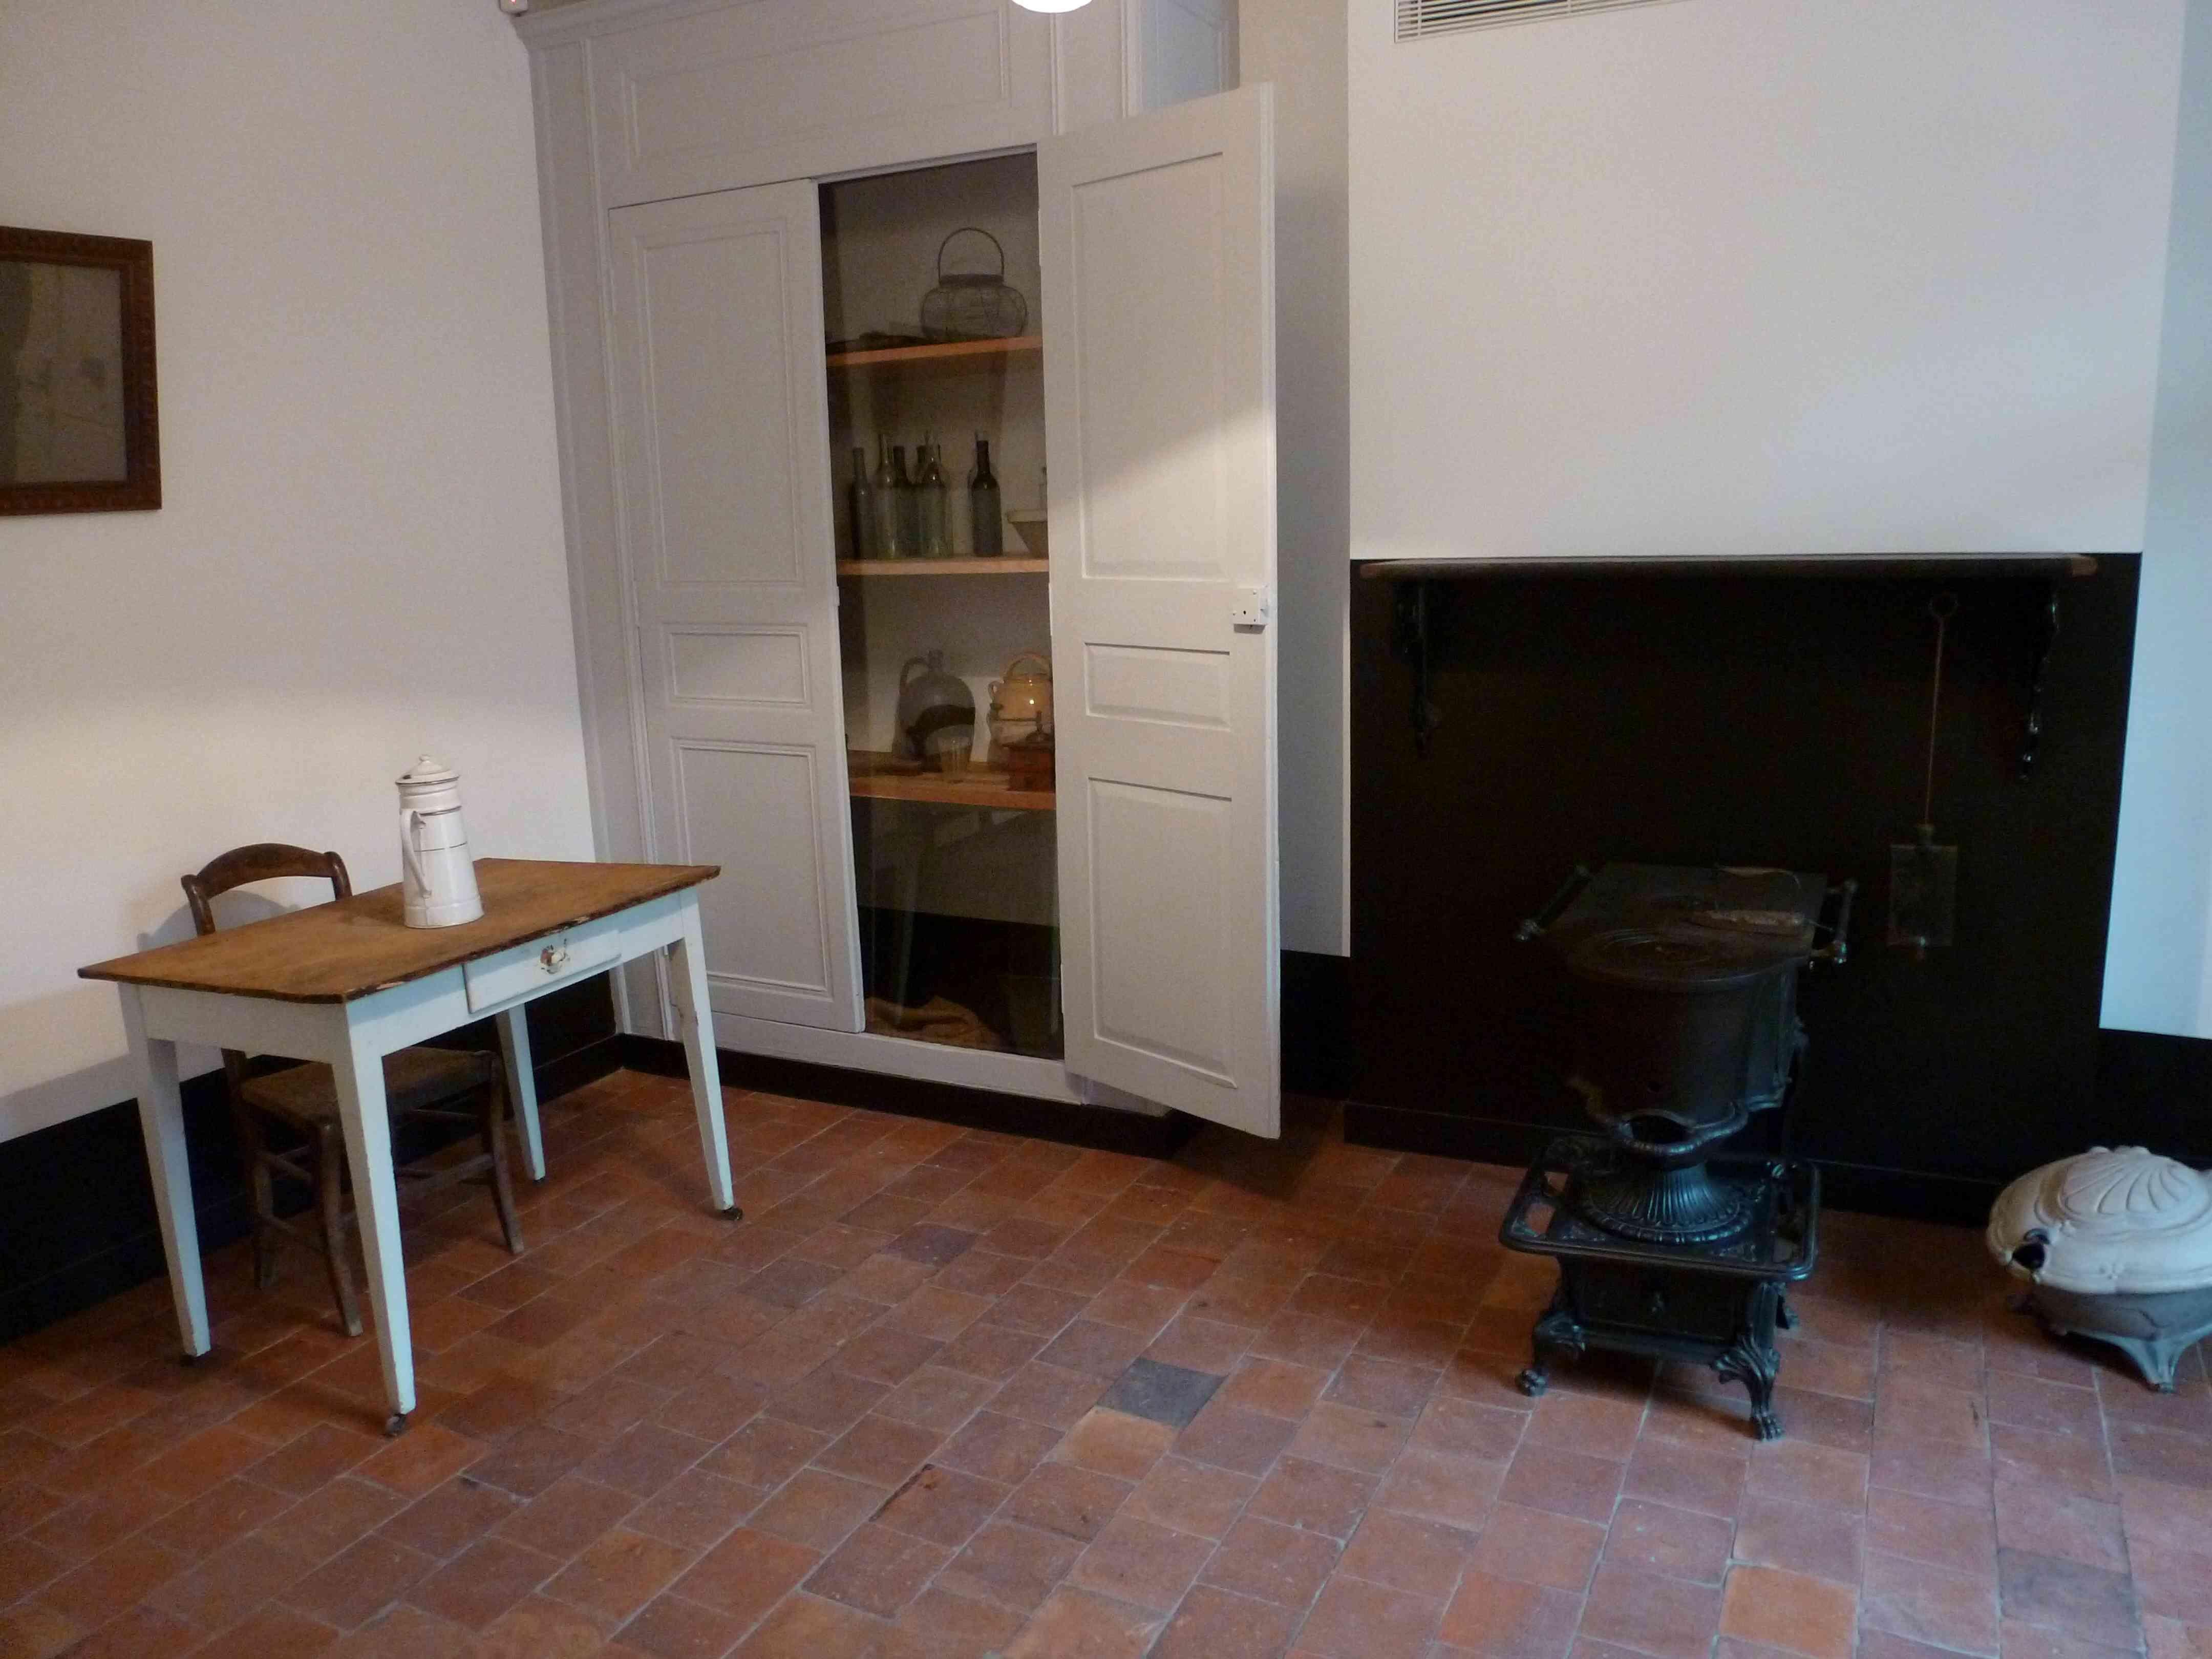 Familistere de Guise salle cuisine poele Godin